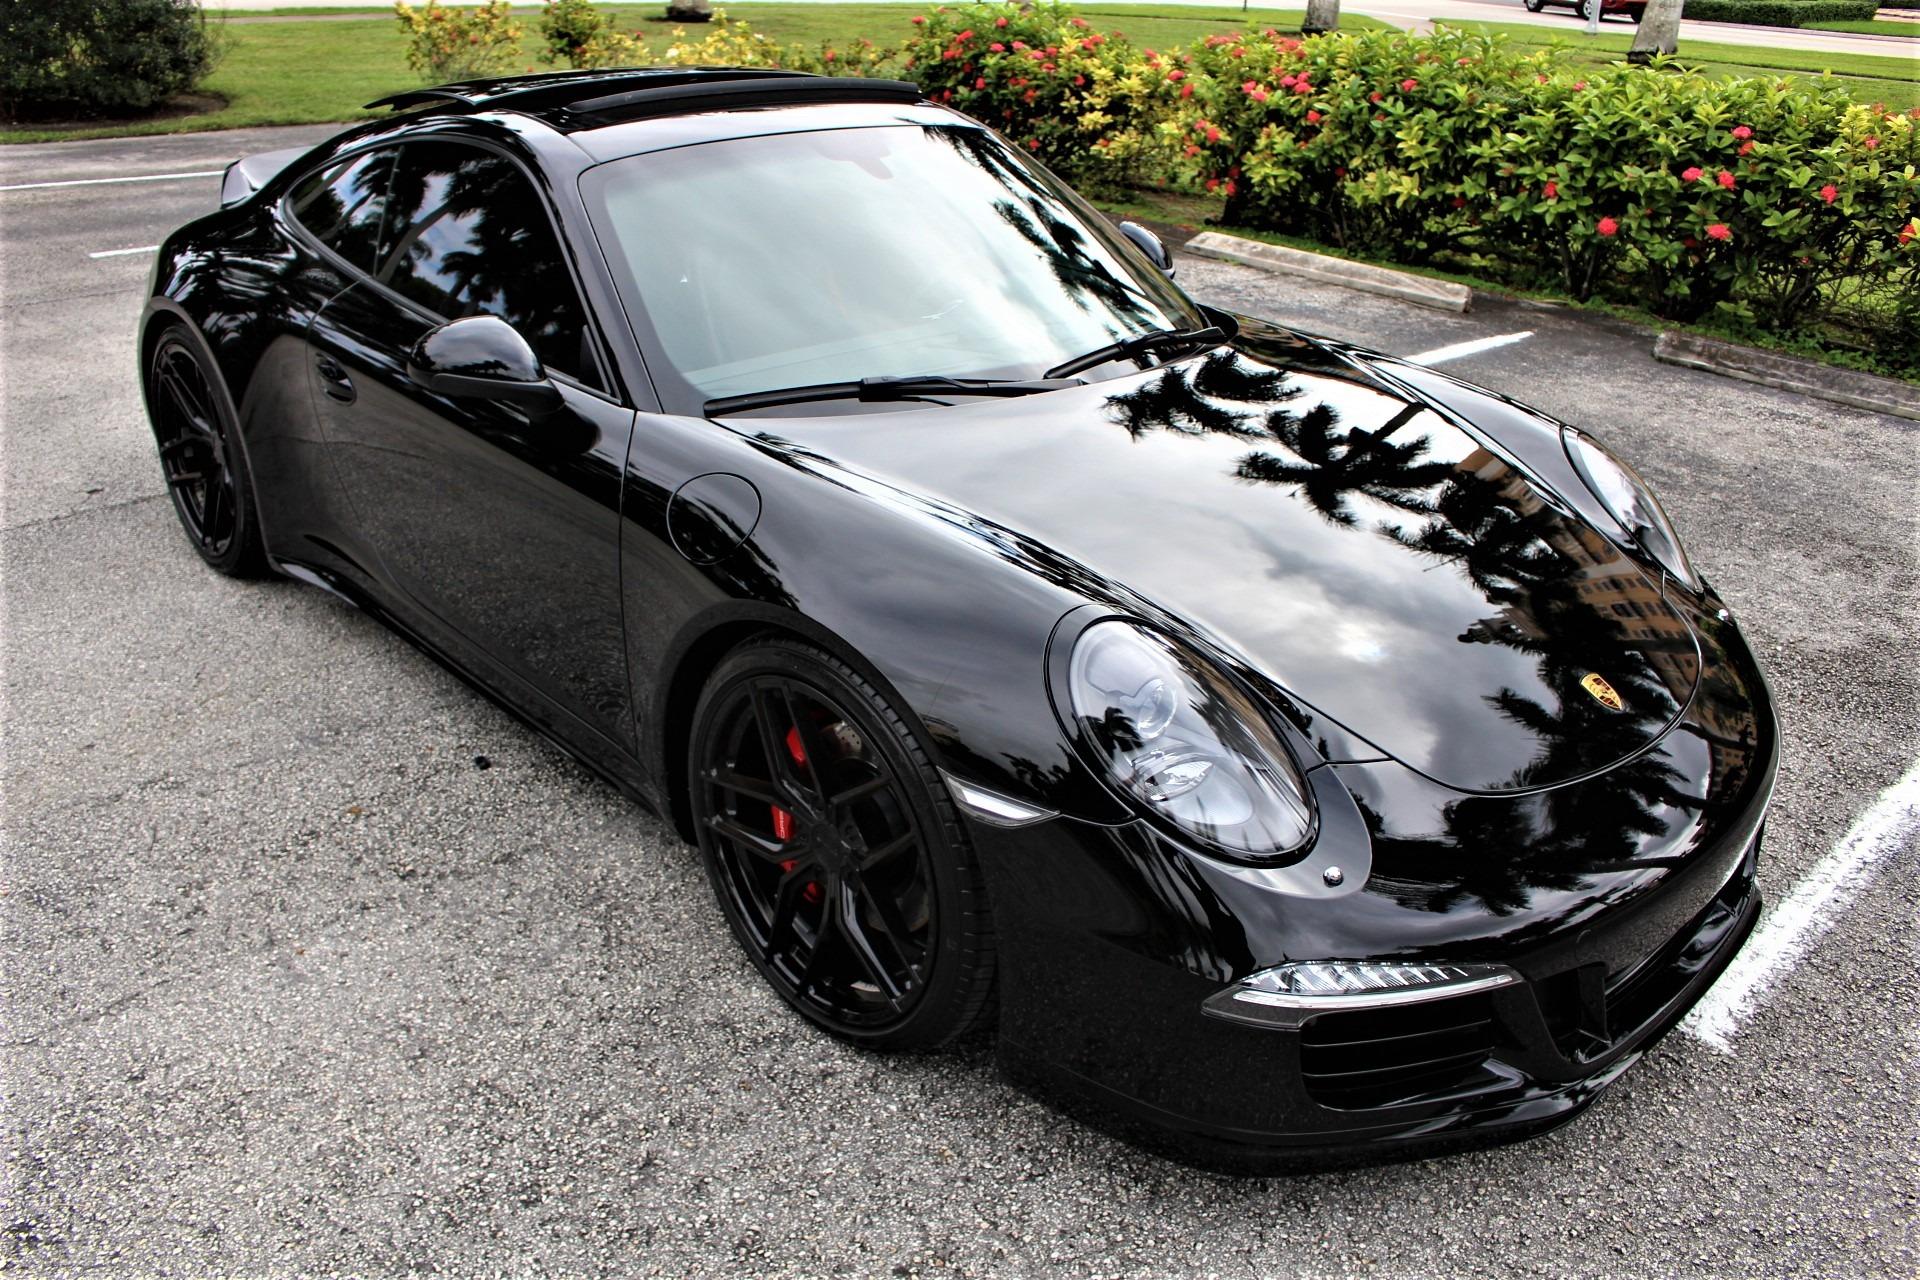 Used 2013 Porsche 911 Carrera 4S for sale $74,850 at The Gables Sports Cars in Miami FL 33146 2